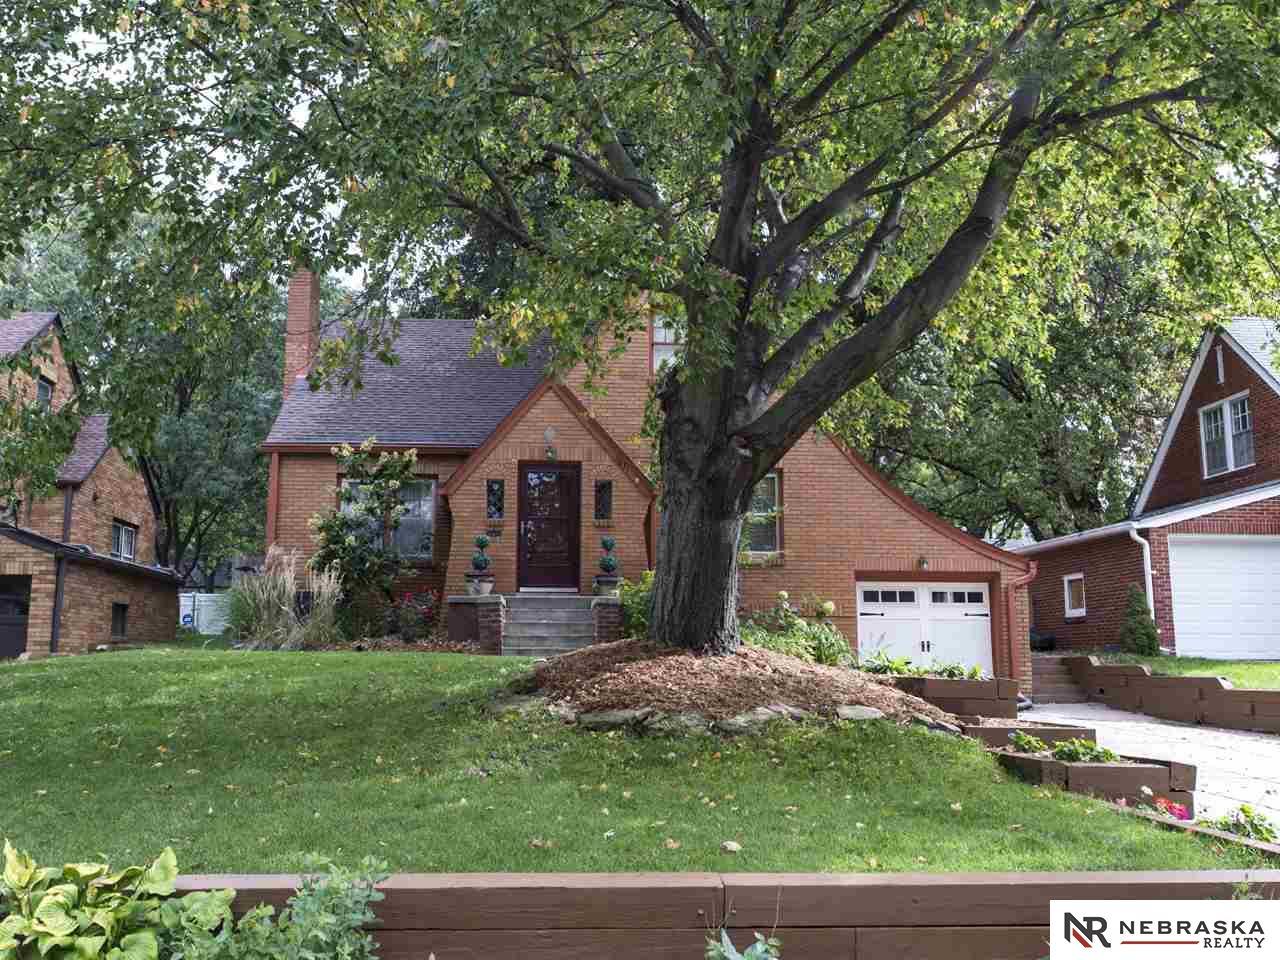 1831 N 54th St, Omaha, NE 68104